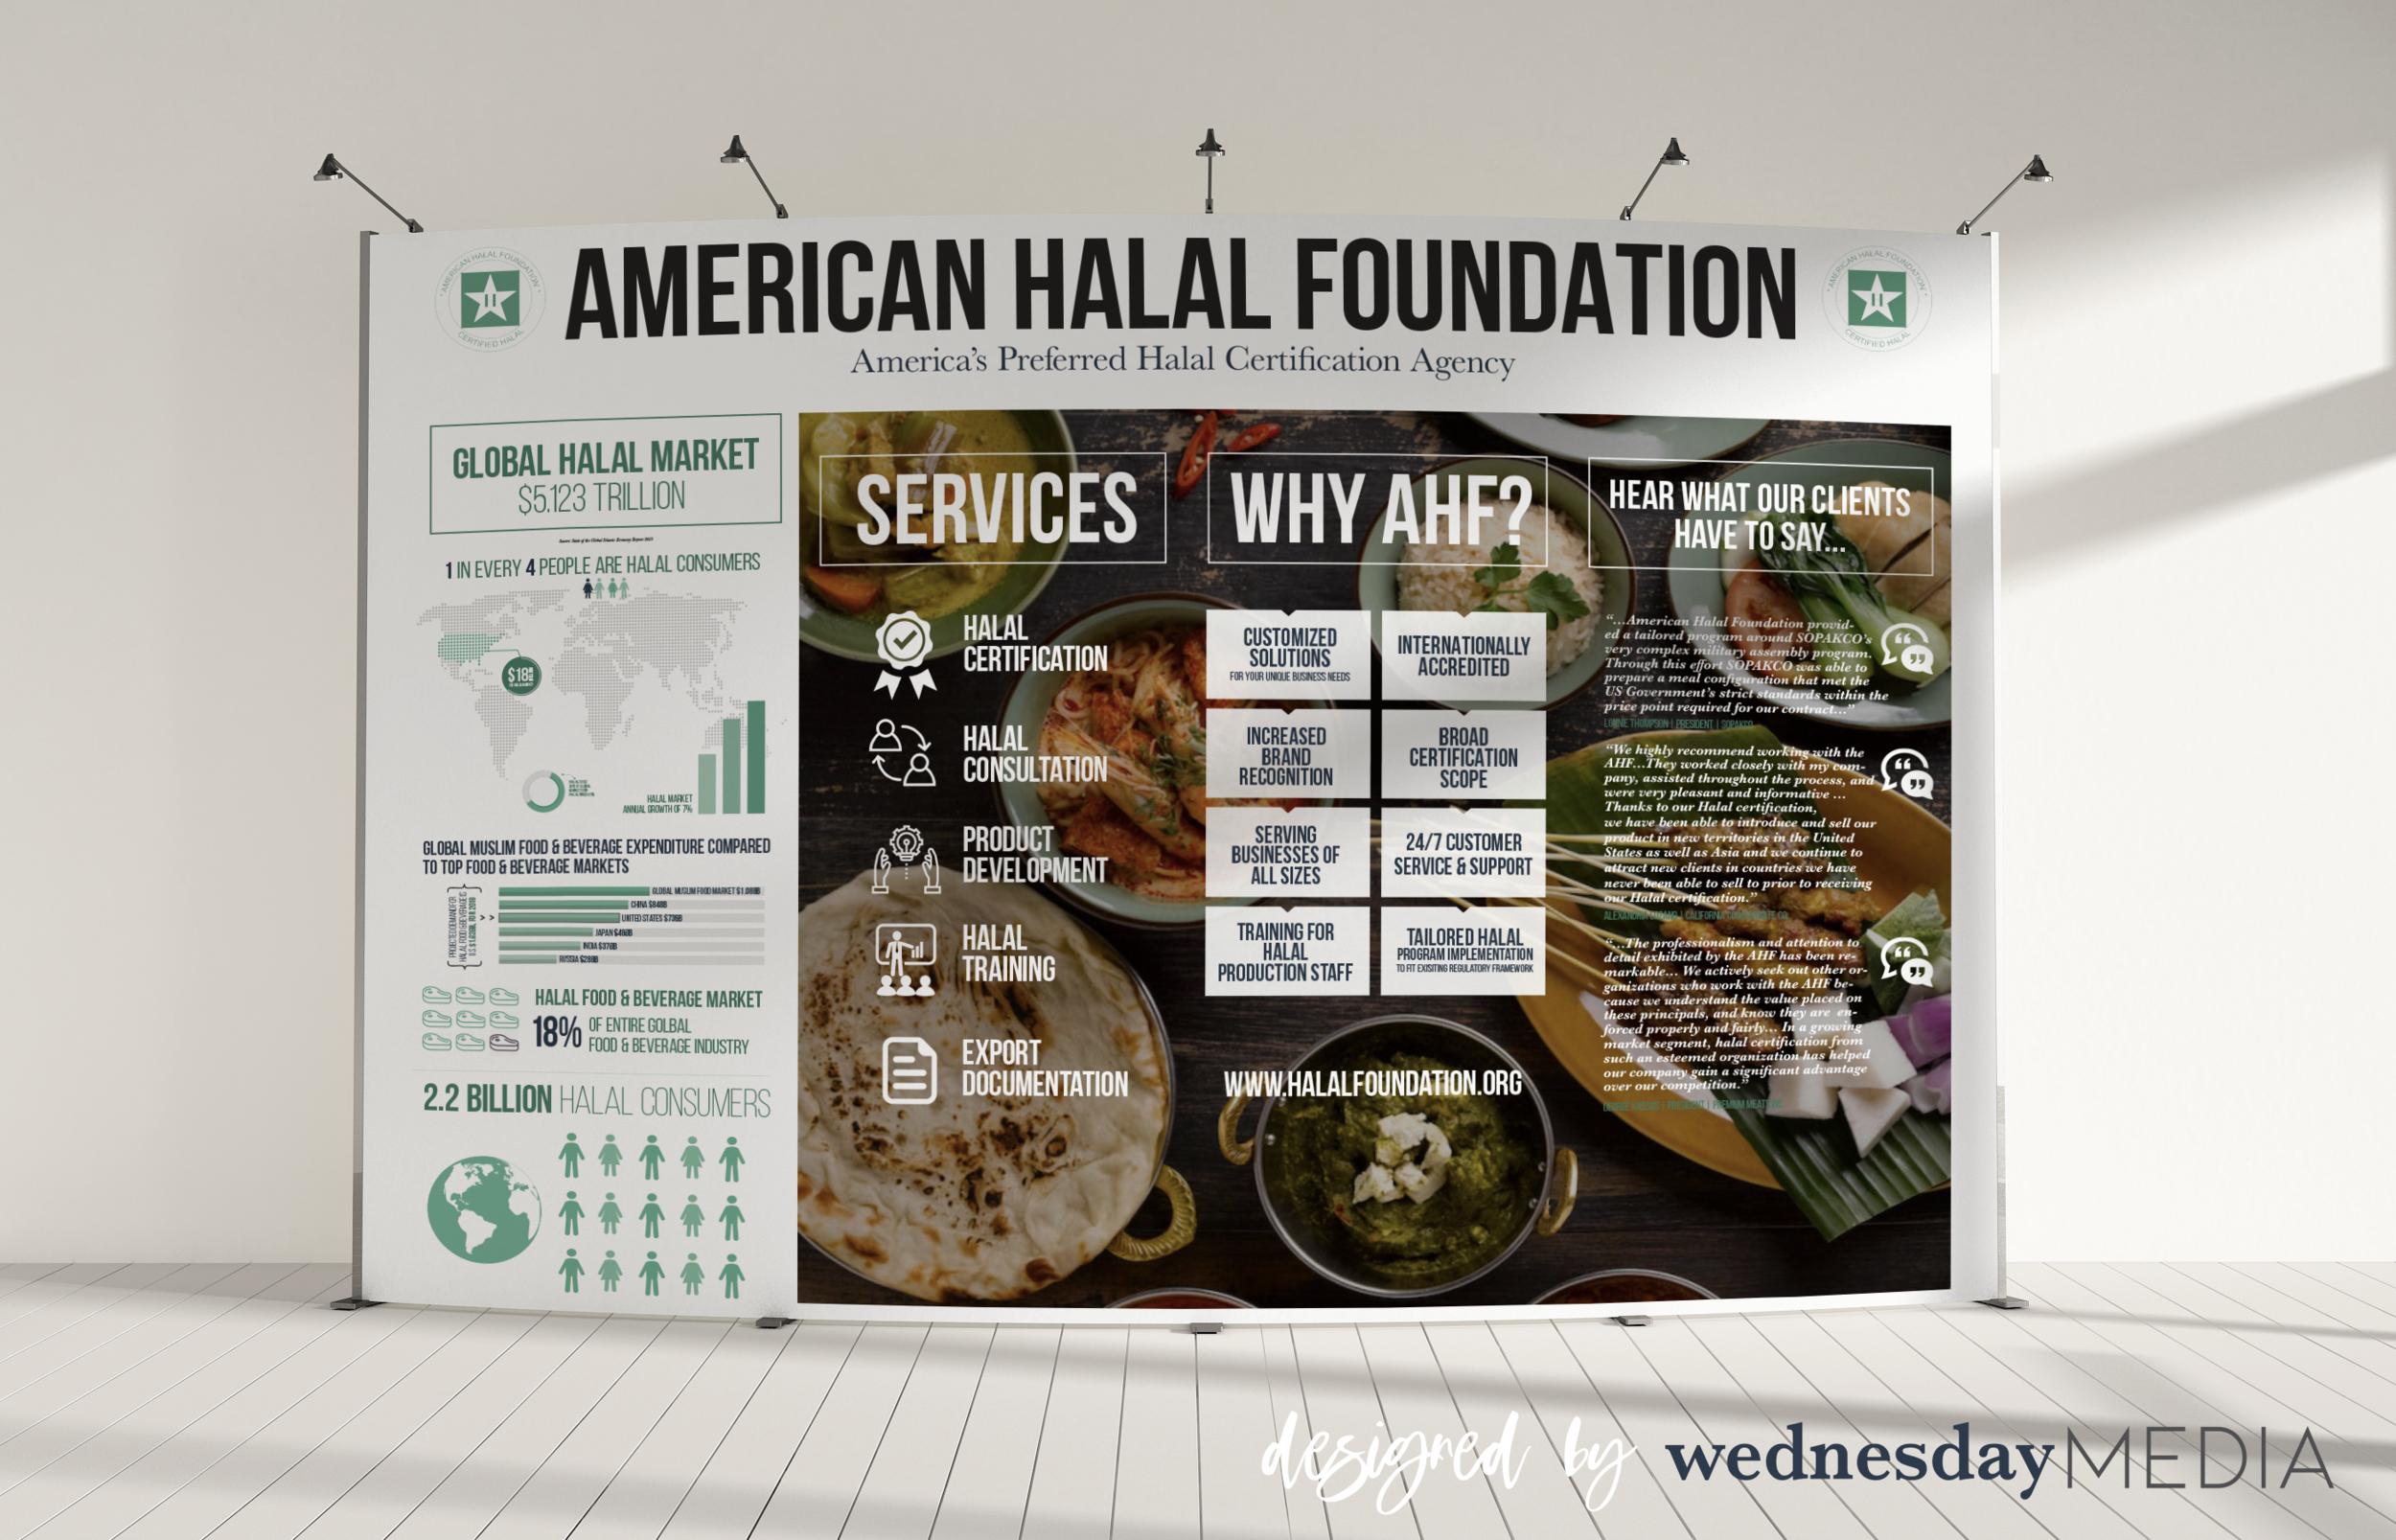 American Halal Foundation panel mockup by Wednesday Media.jpg